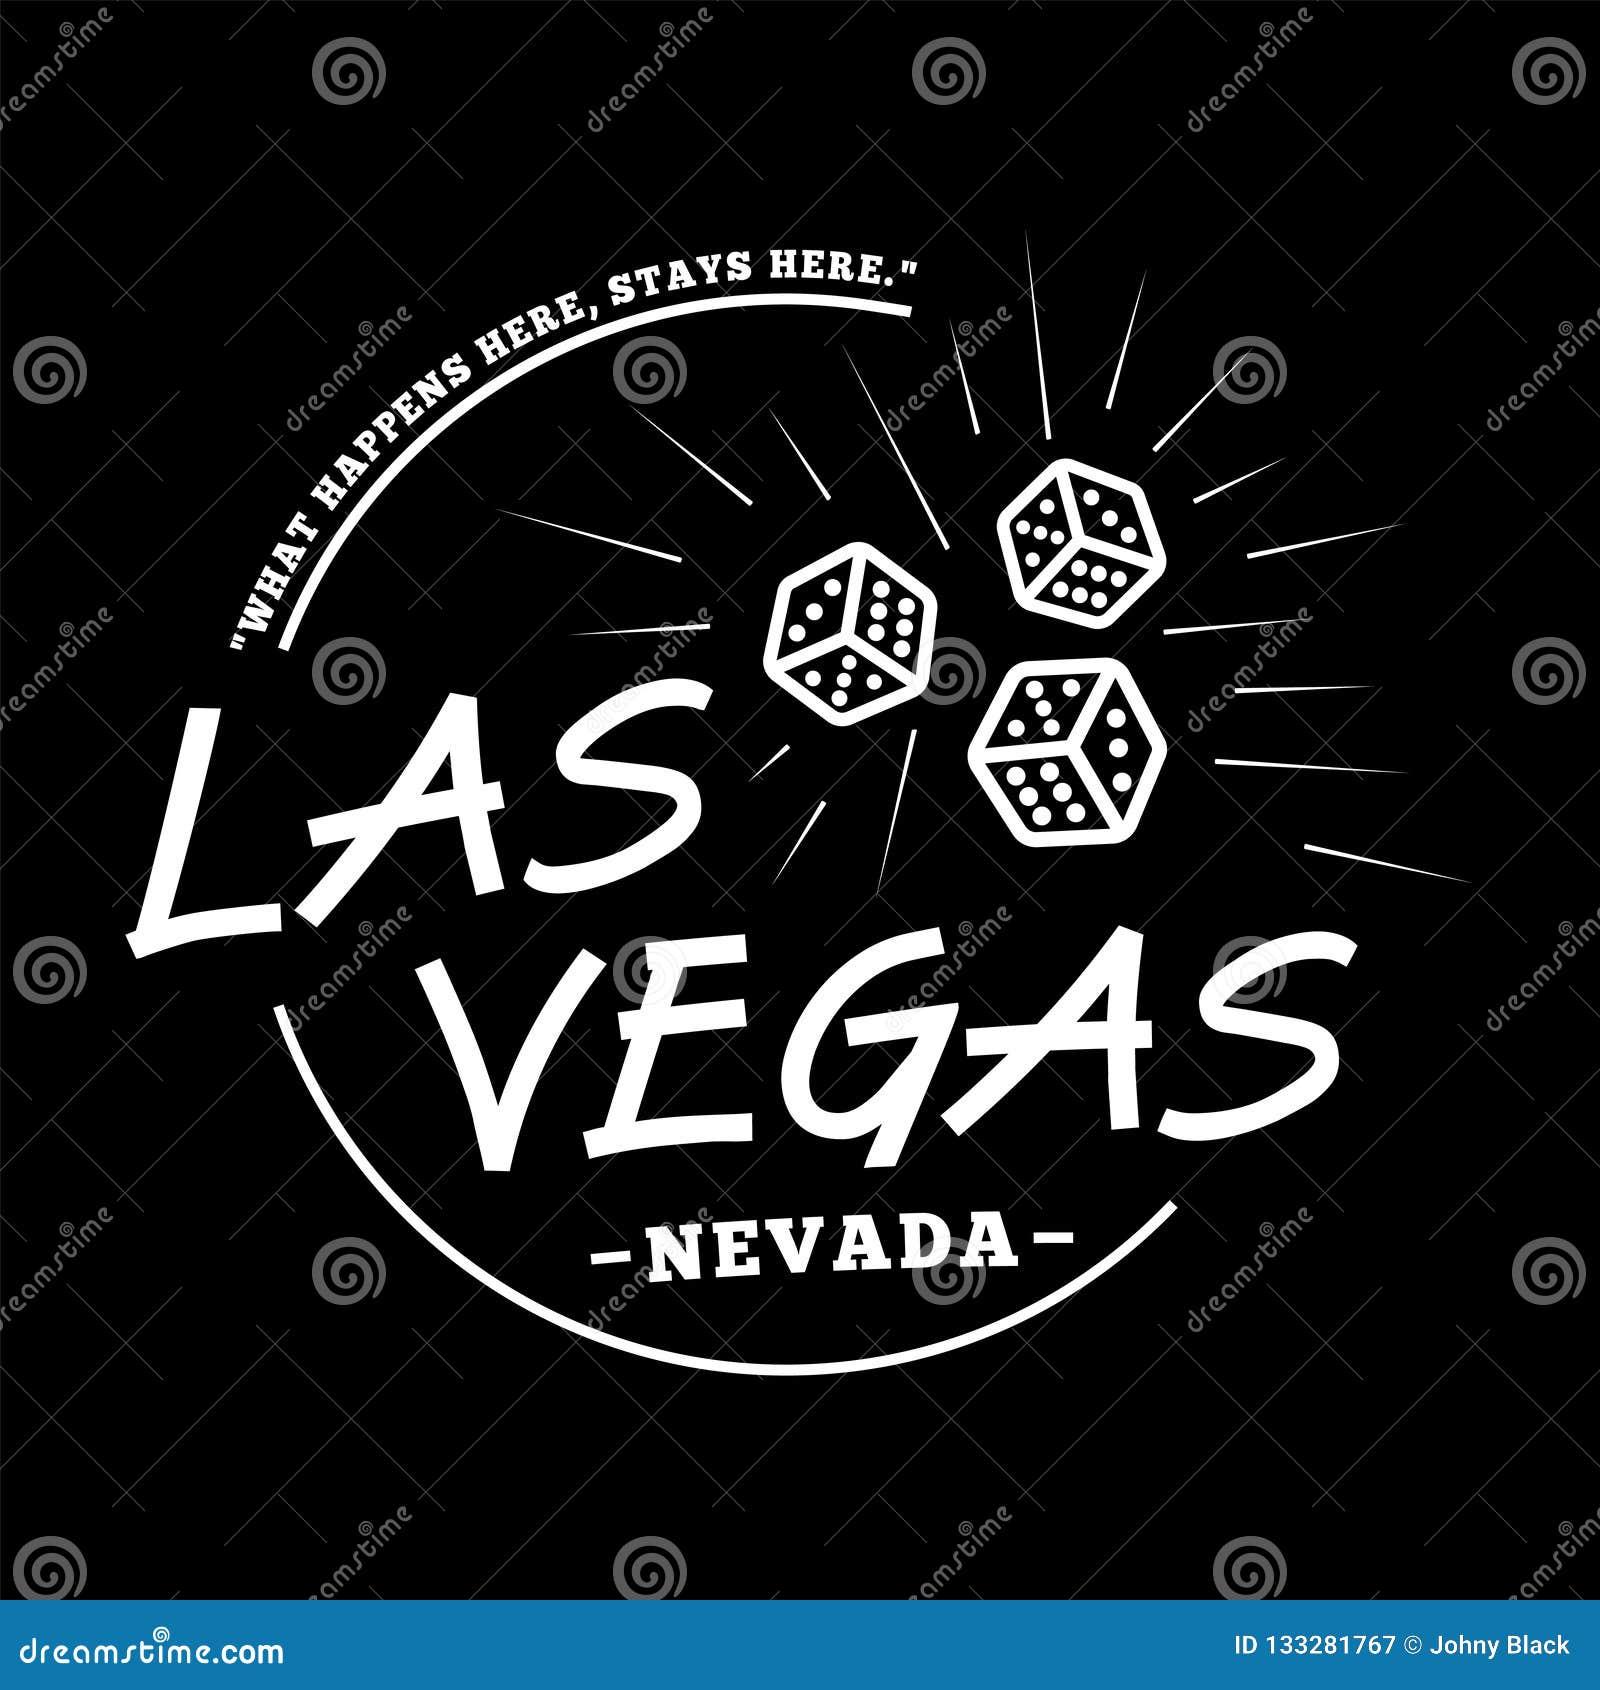 Las Vegas Logotype Las Vegas Vector And Illustration Stock Vector